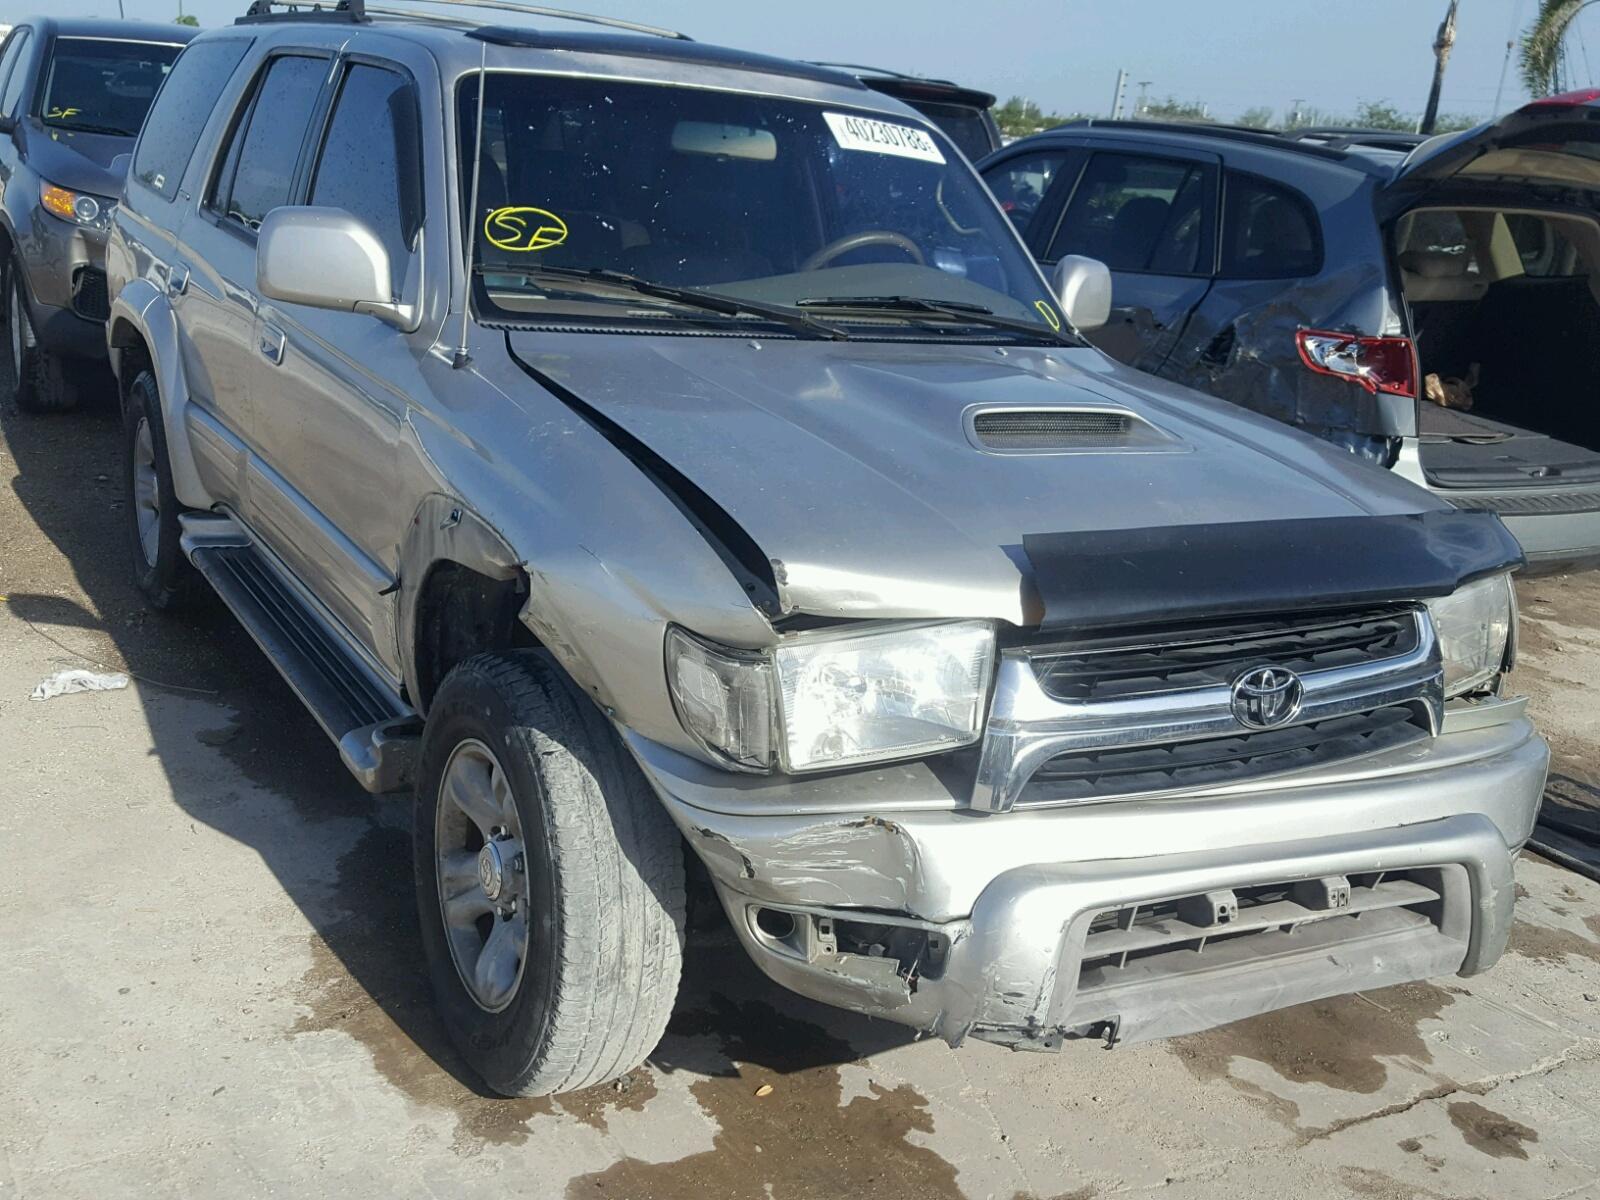 2001 Toyota 4runner LI for sale at Copart West Palm Beach FL Lot